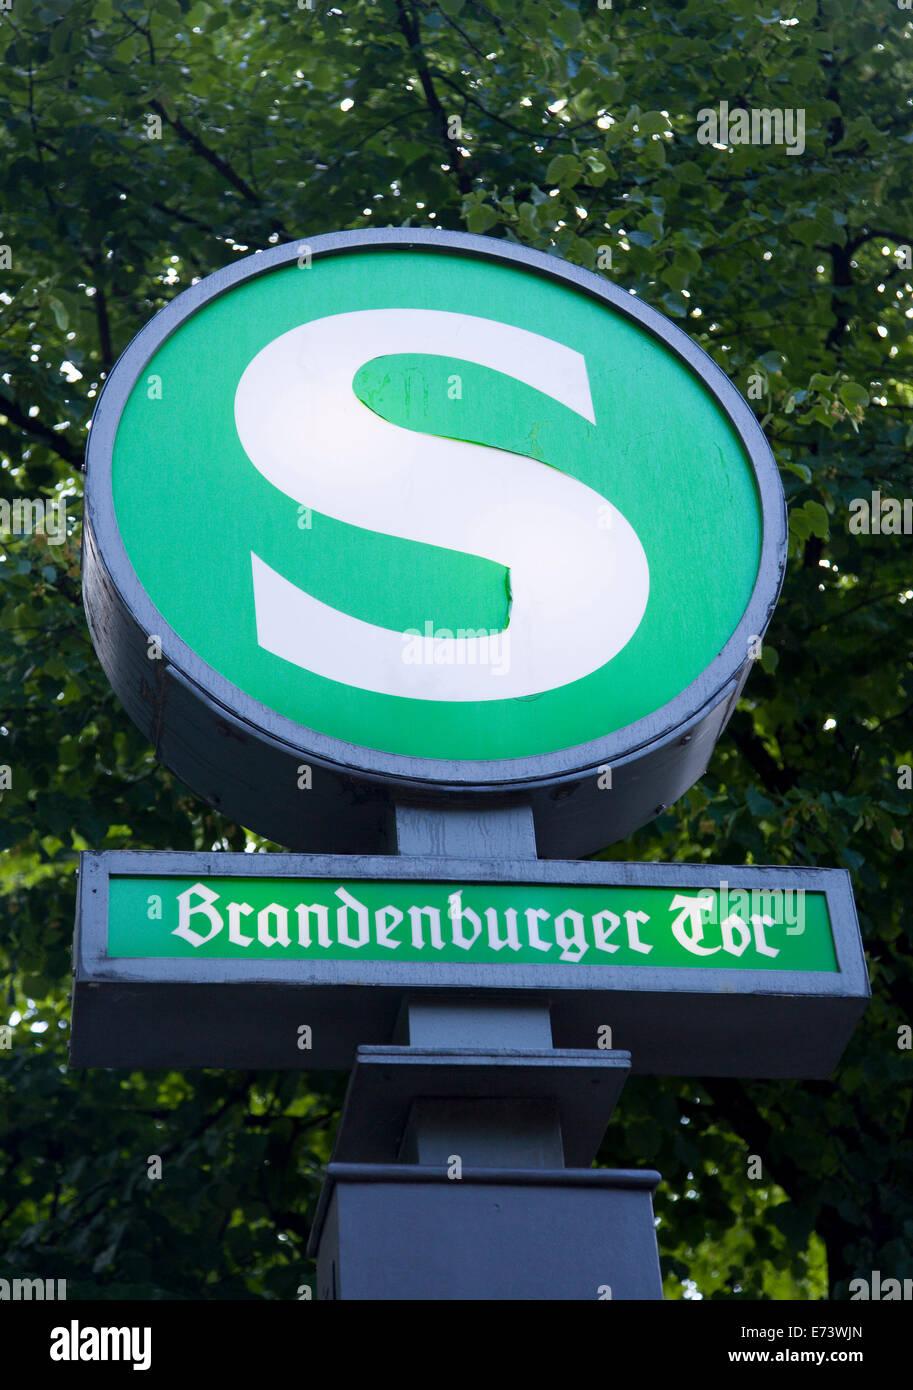 Germany, Berlin, Mitte, Brandenburger Tor, Brandenburg Gate, S-Bahn train station sign on Unter den Linden. Stock Photo